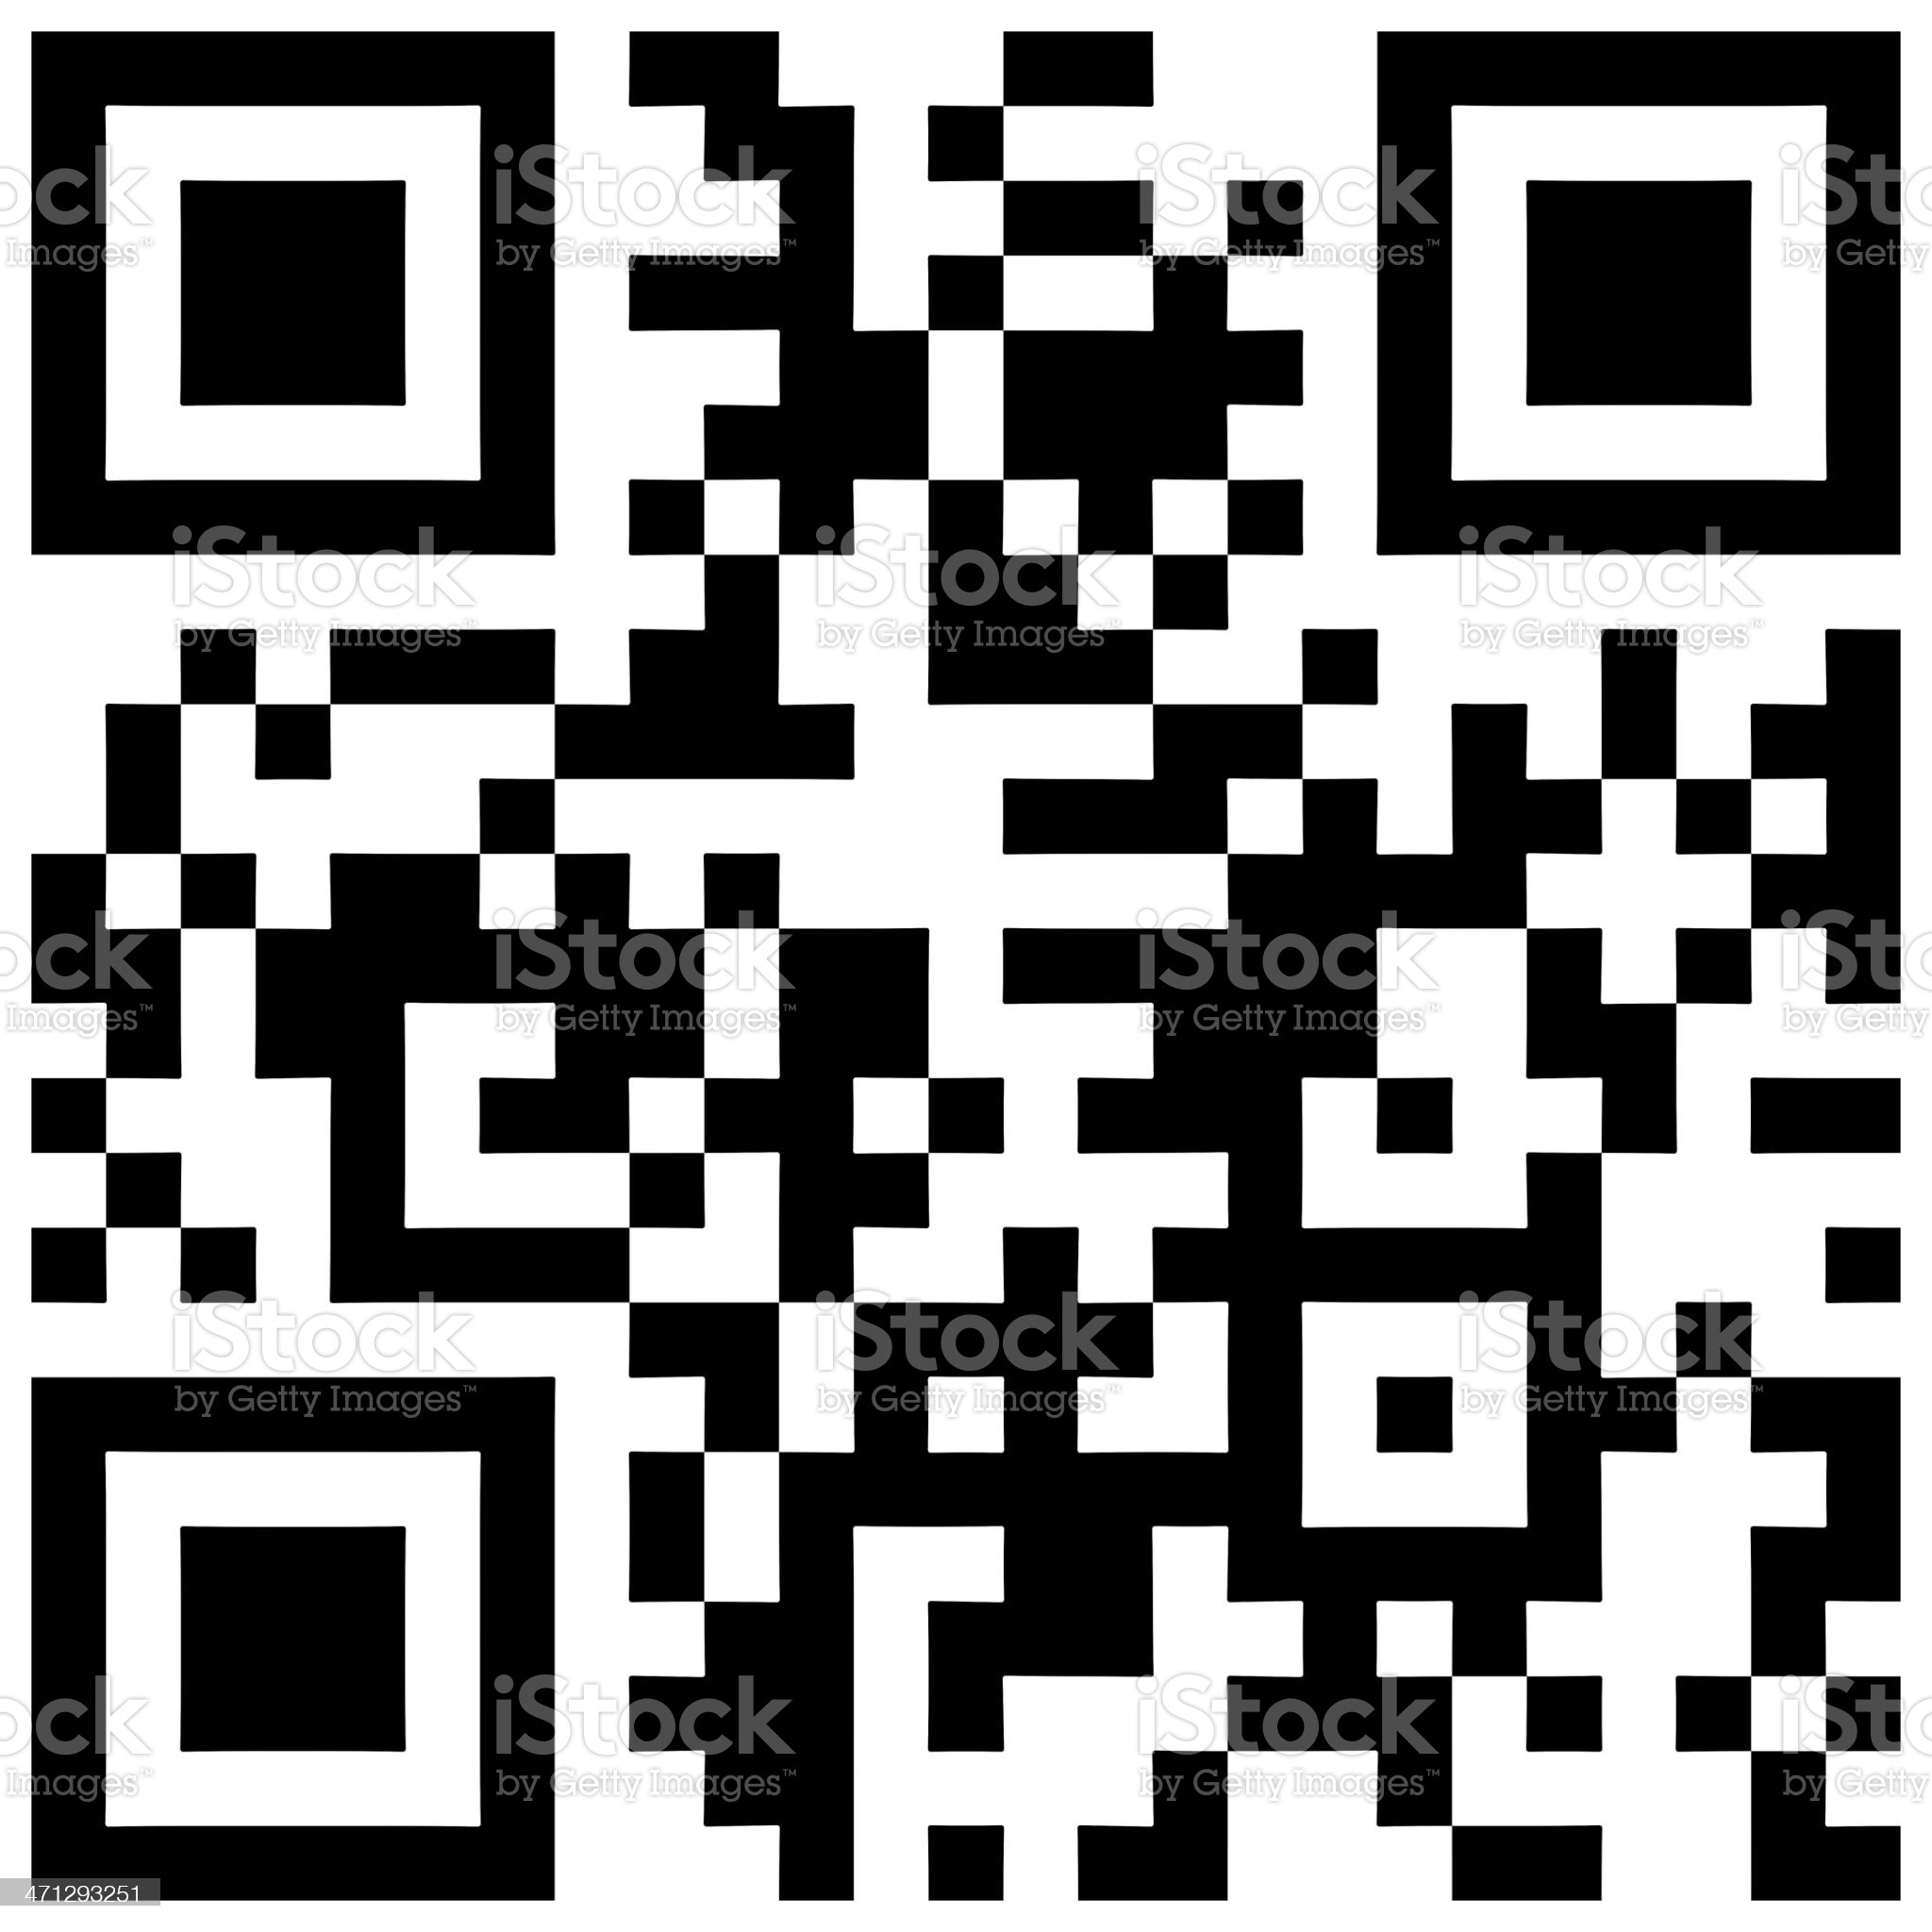 QR Code royalty-free stock photo